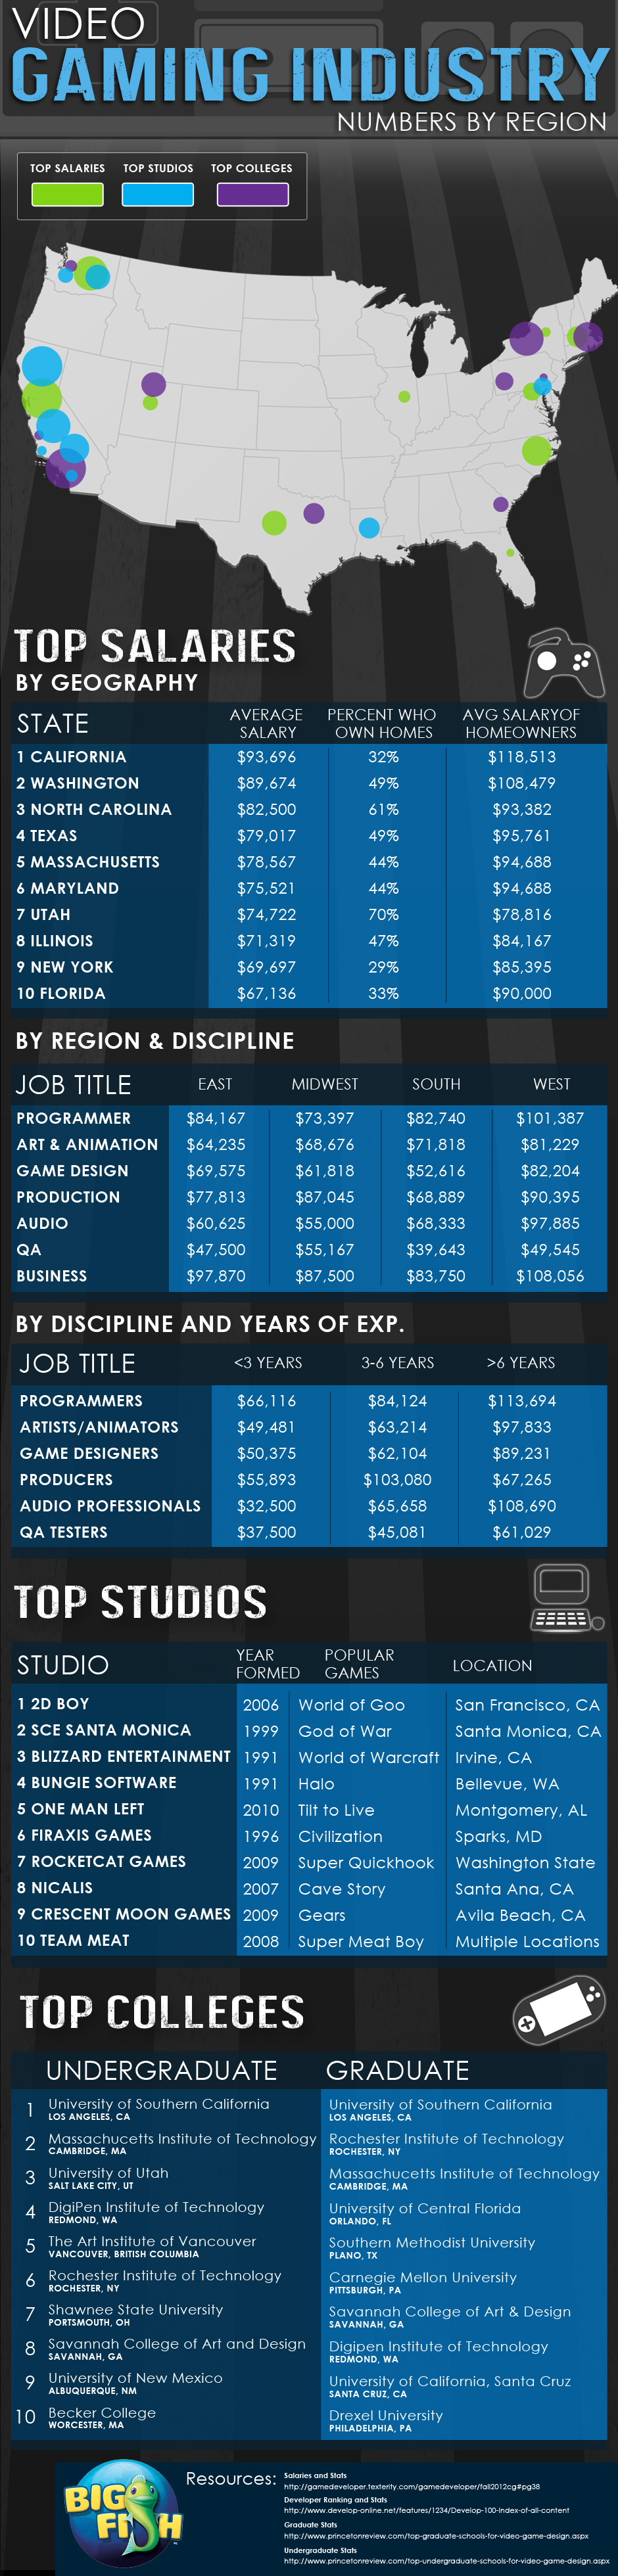 Top Gaming Studios, Schools & Salaries